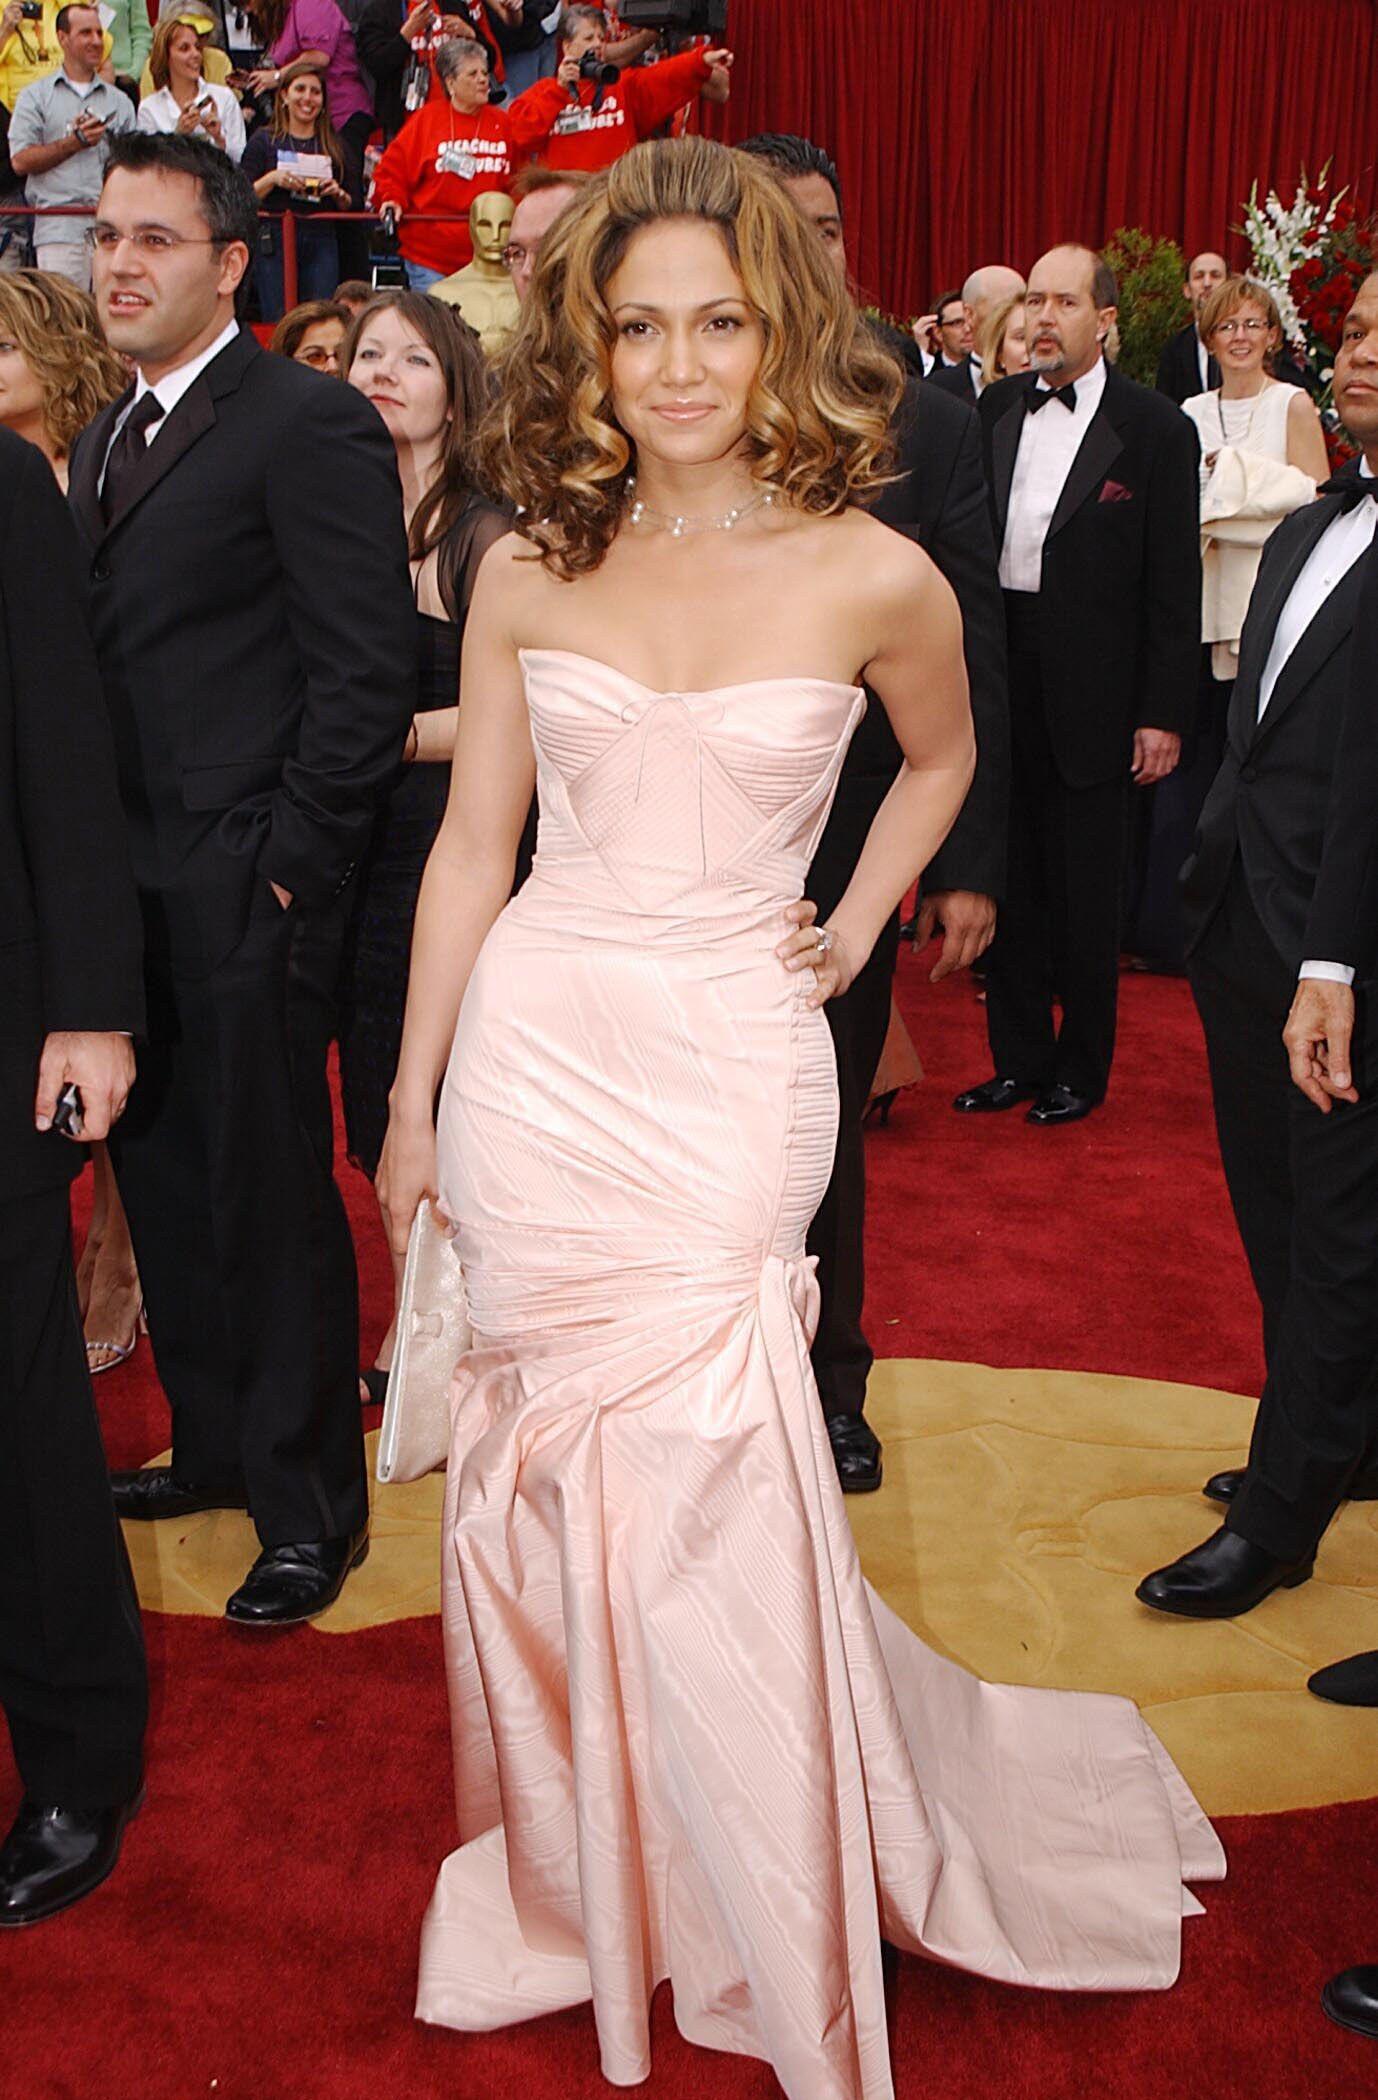 Jennifer Lopezs Best Fashion Moments on The Red Carpet